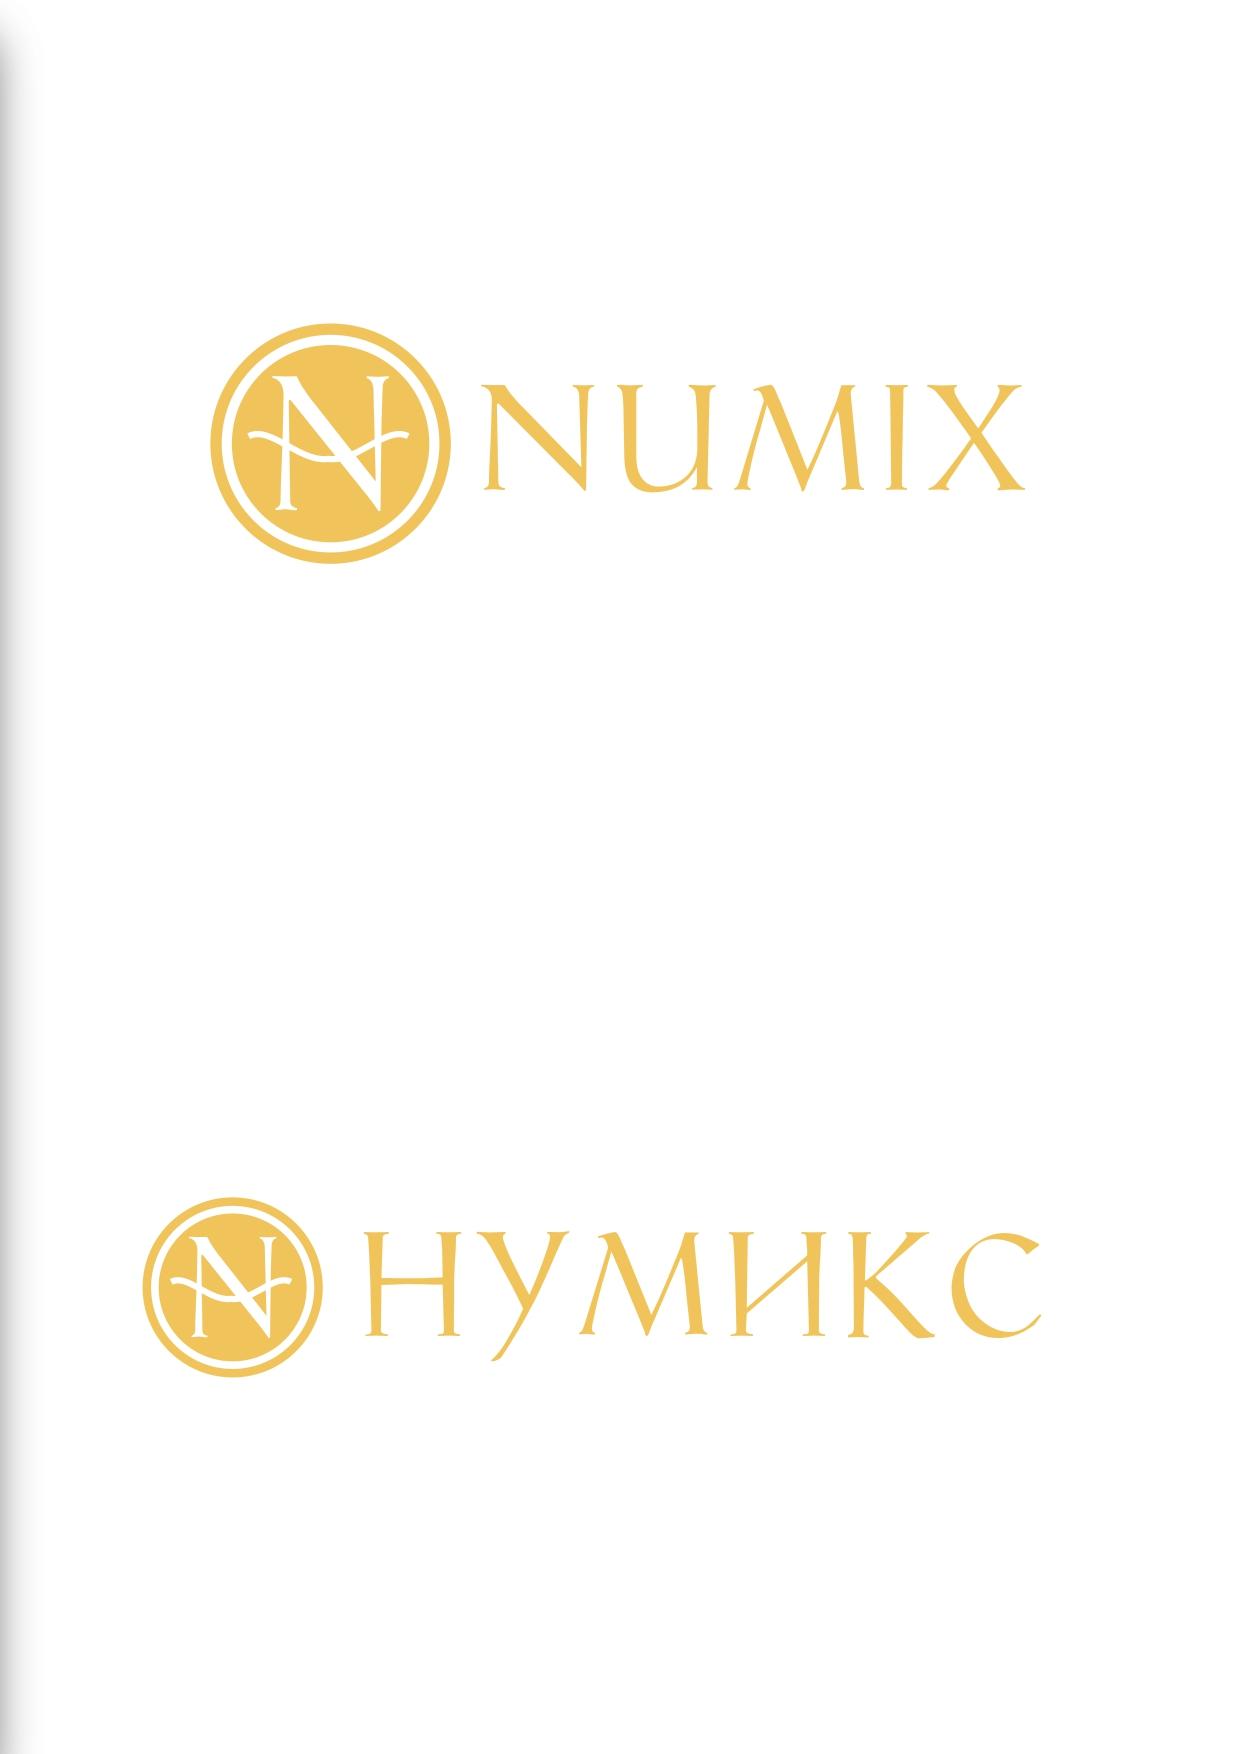 Логотип для интернет-магазина фото f_9695ec7d695899d4.jpg